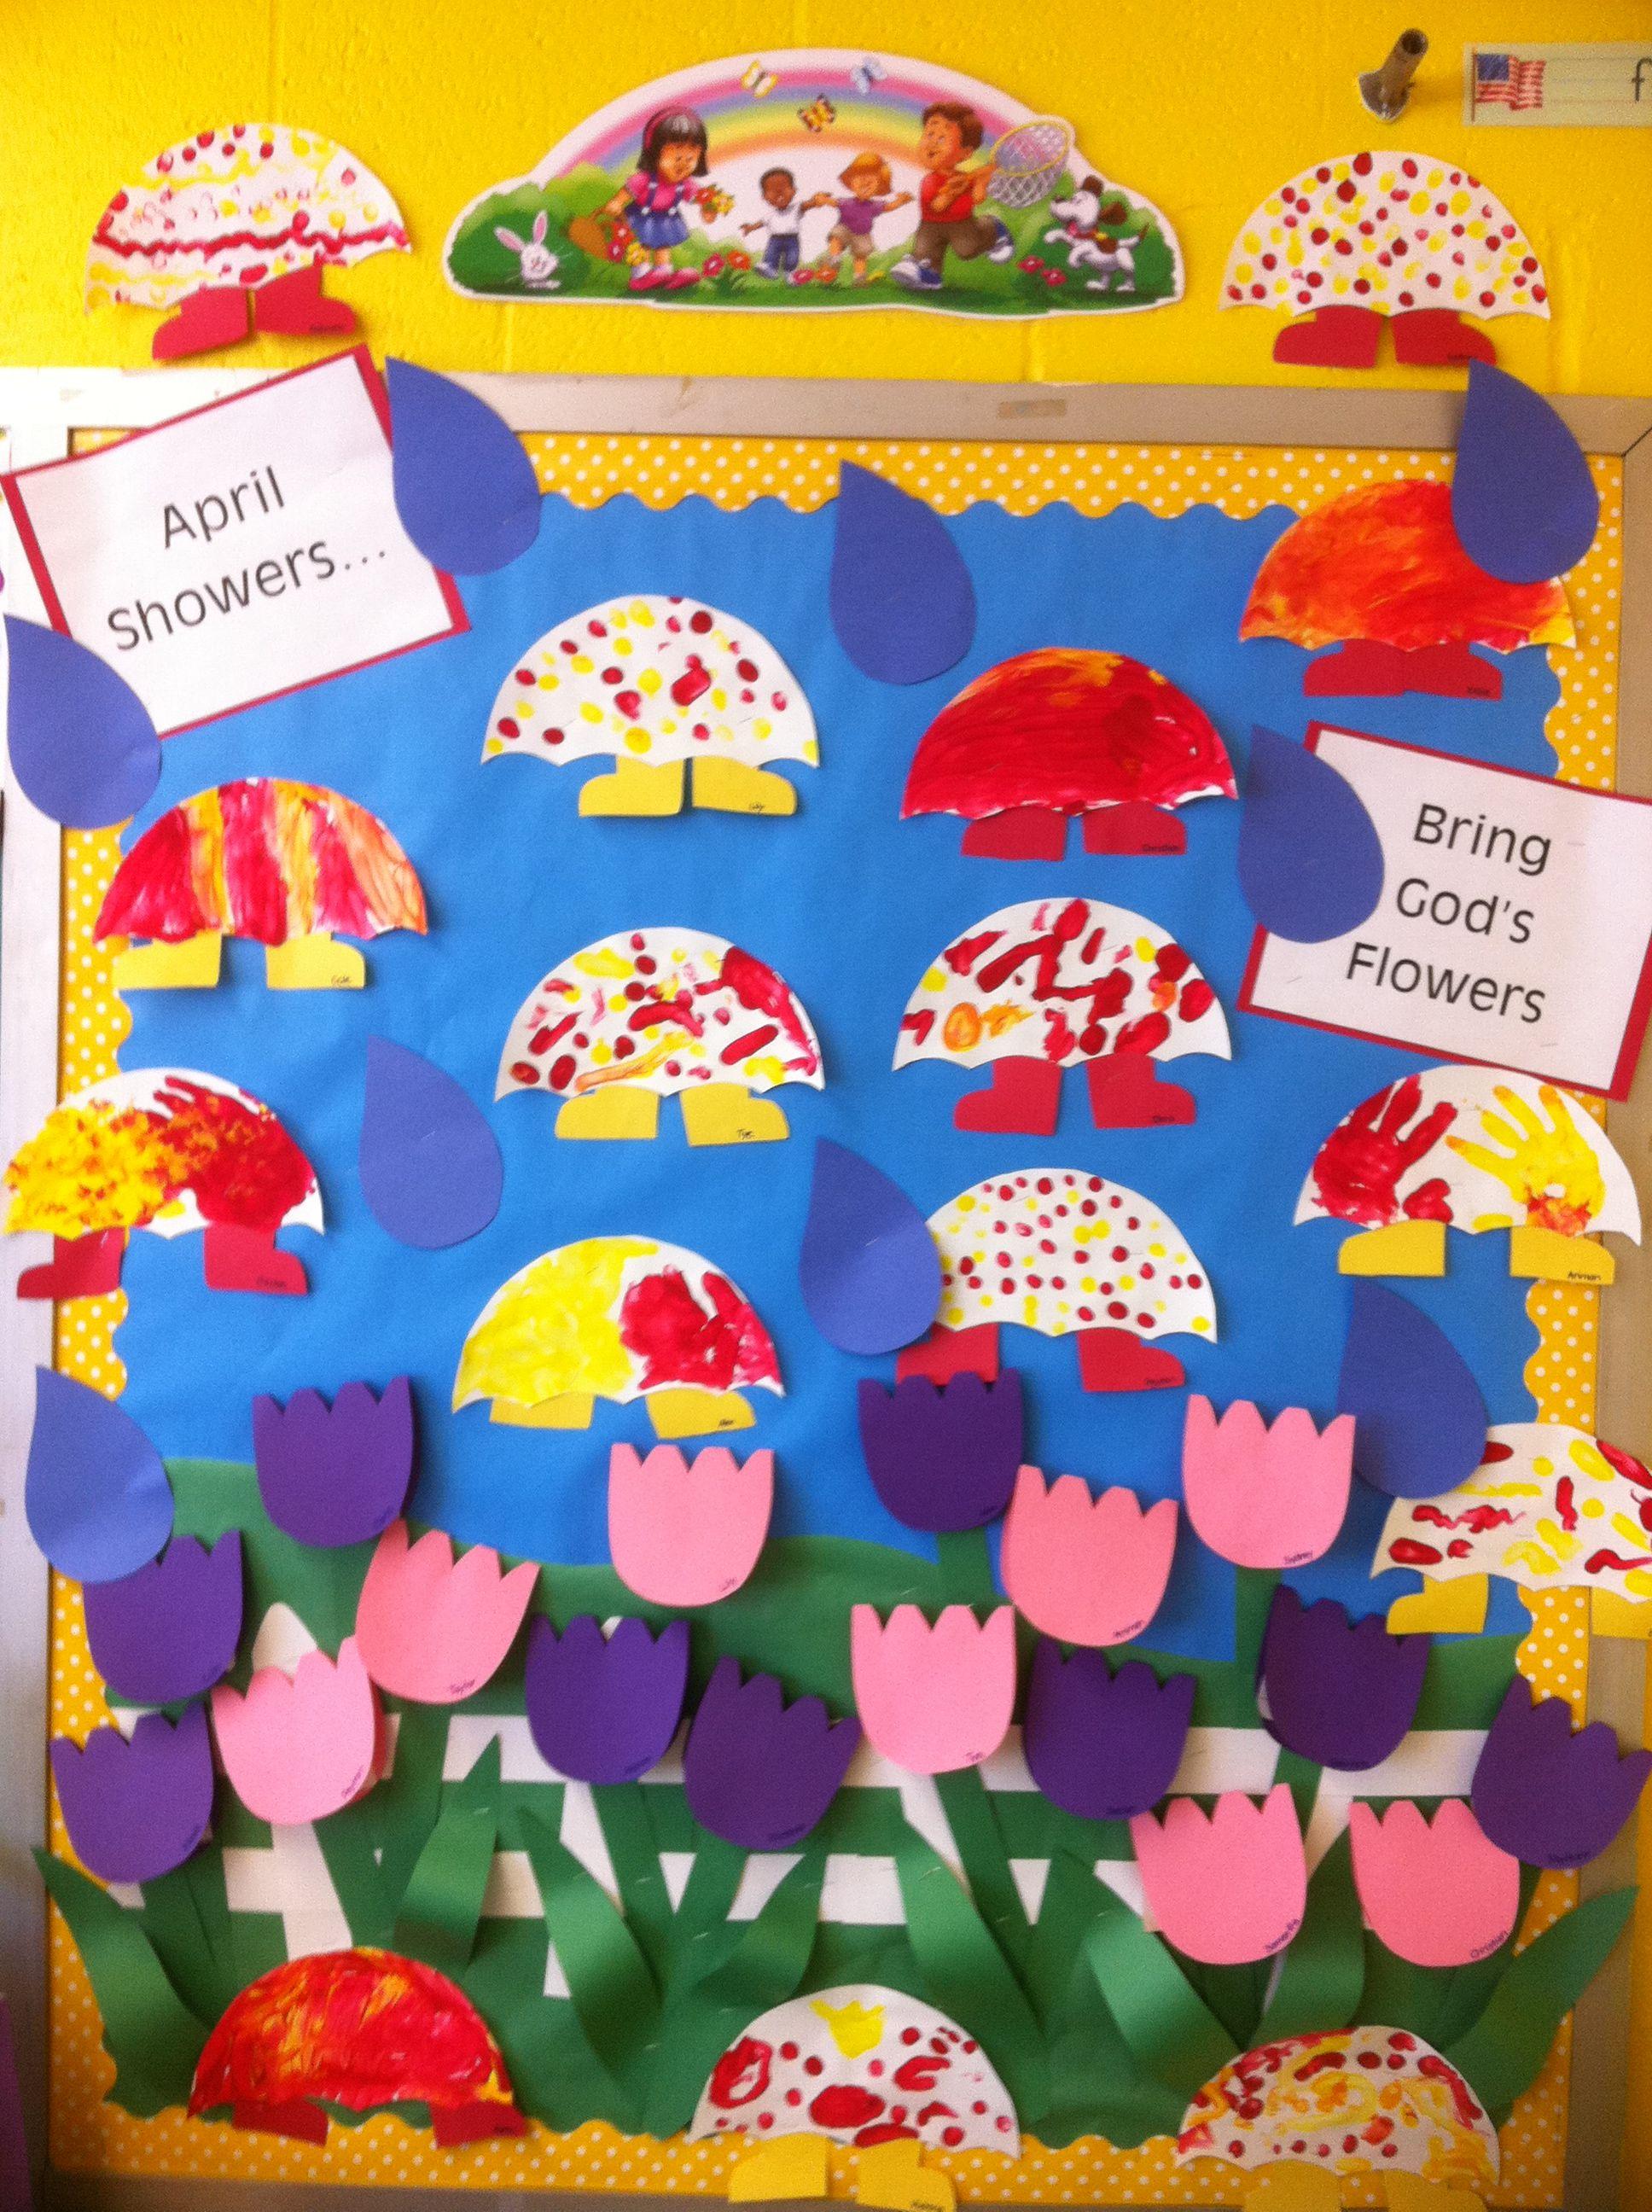 April Showers Bring God S Flowers Bulletin Board